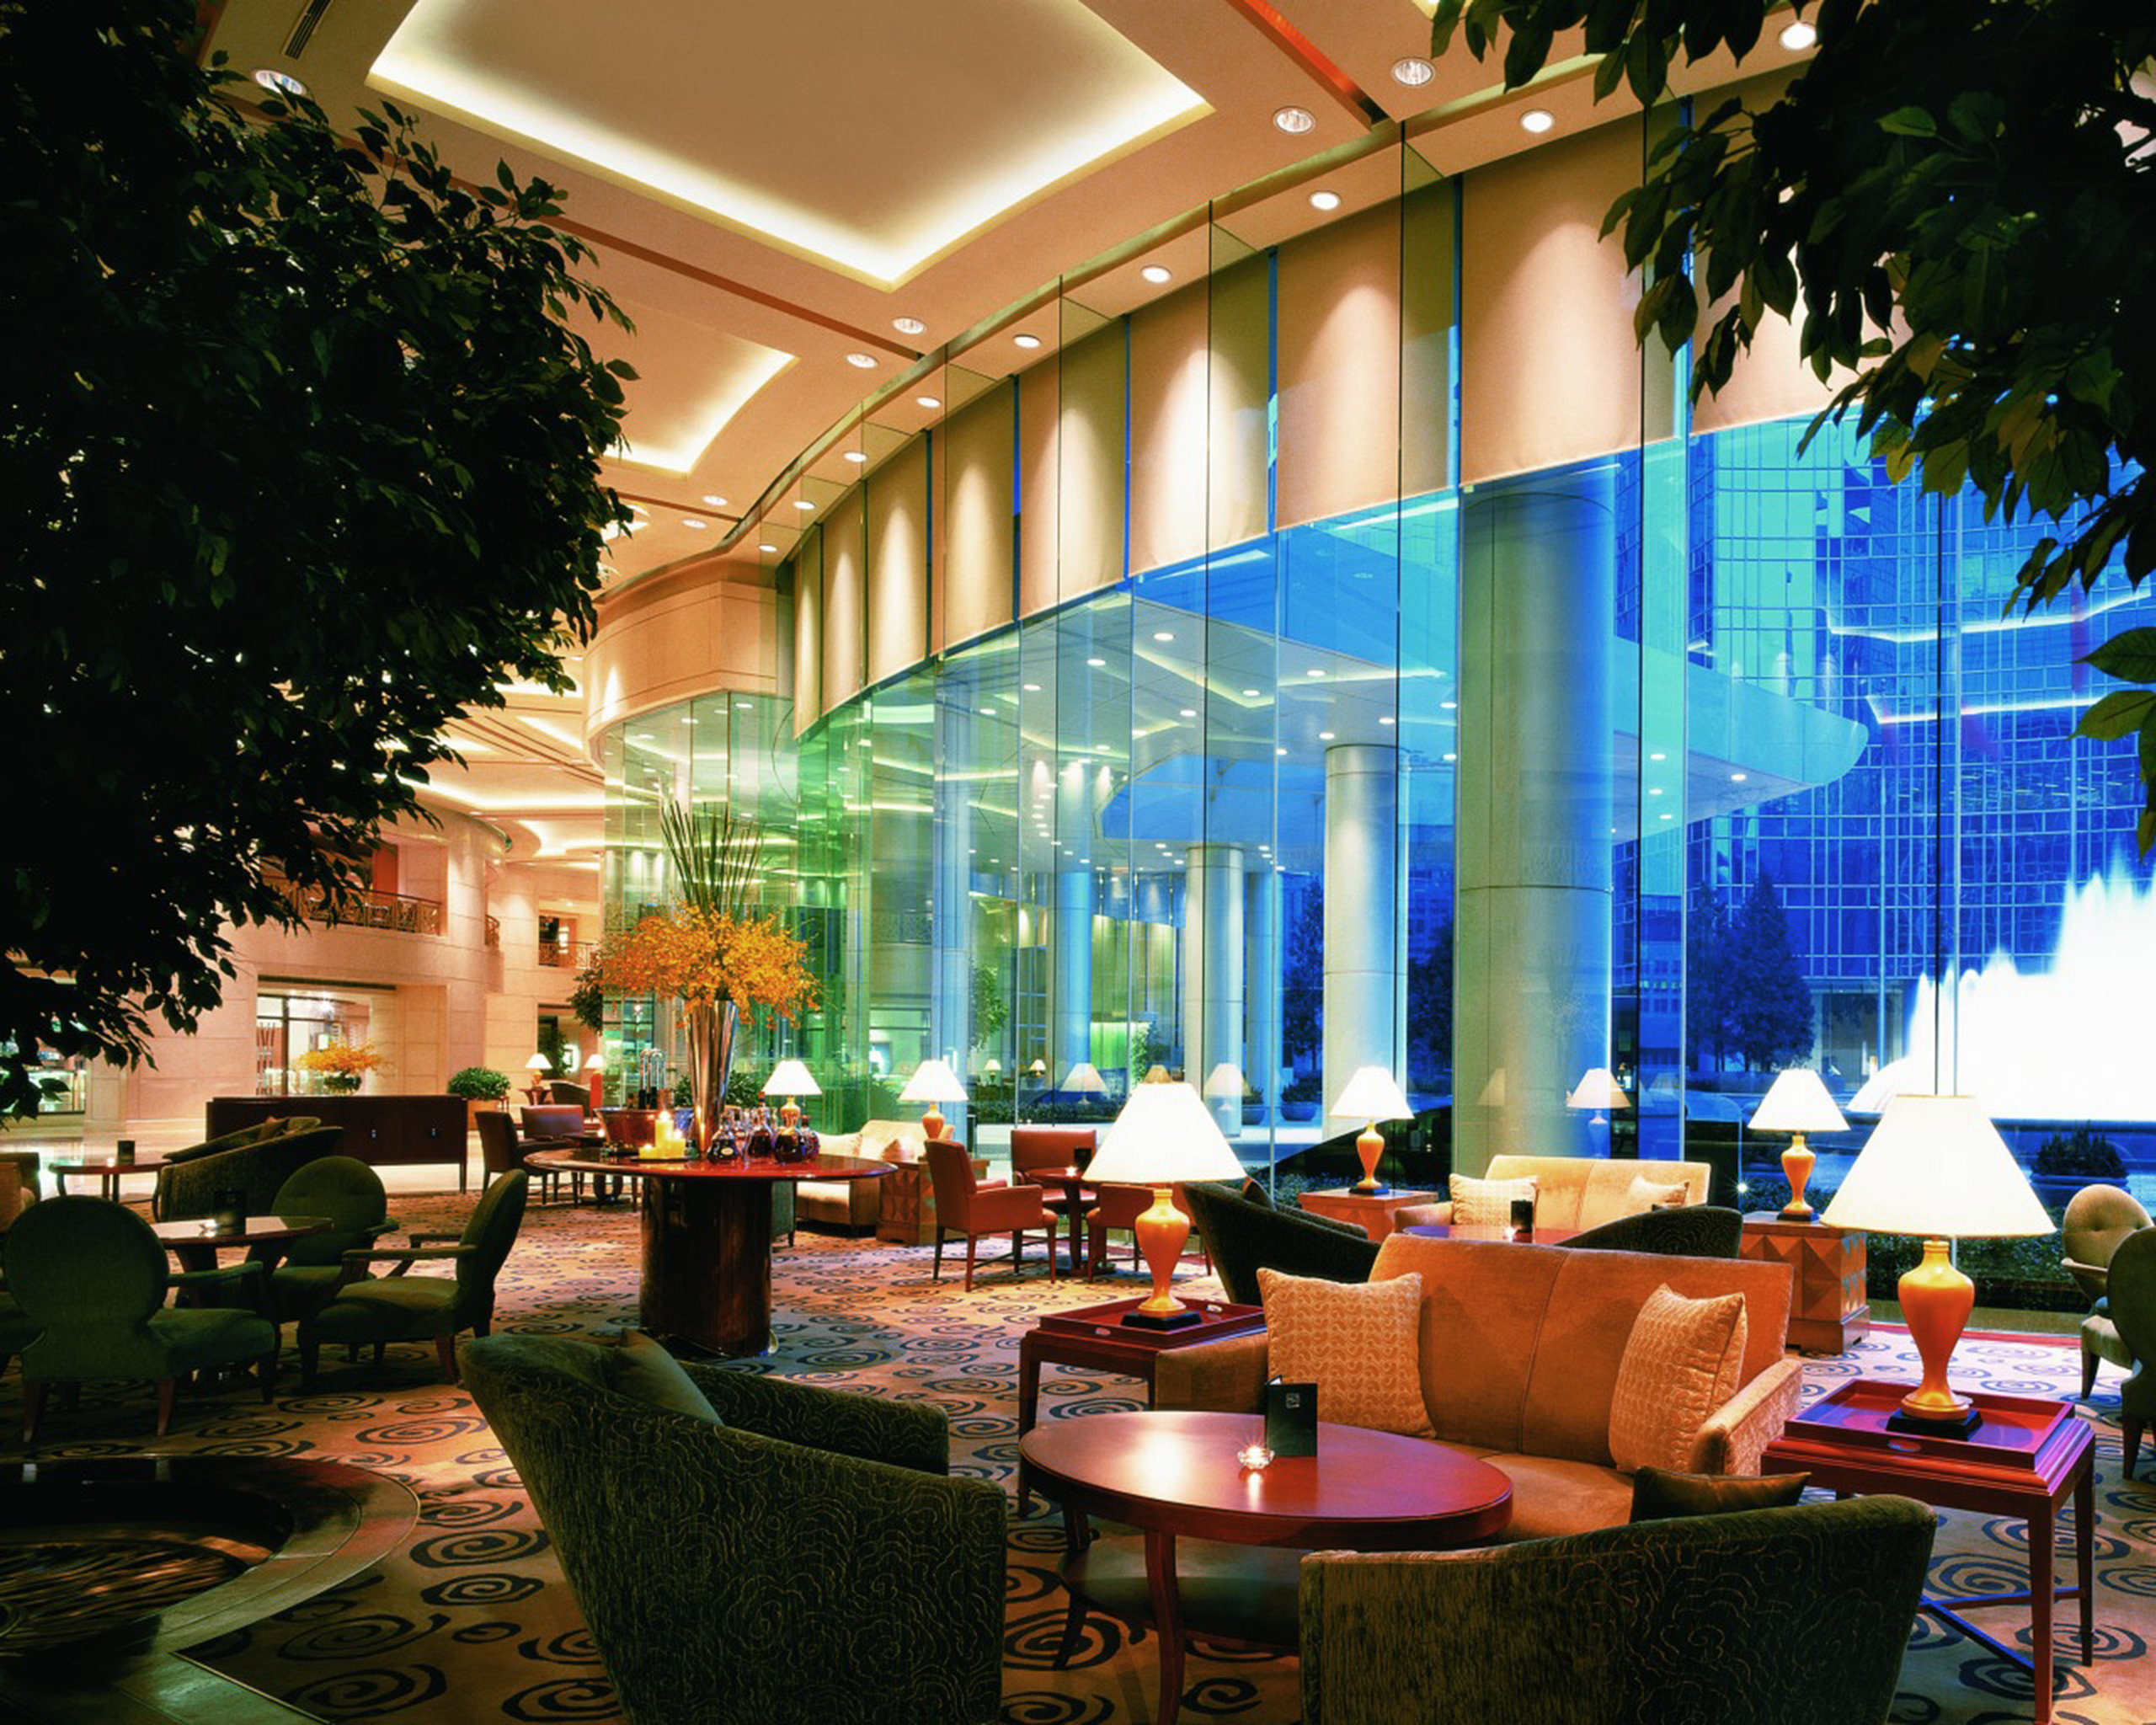 Bar City Dining Drink Eat Scenic views tree Lobby restaurant convention center plaza Resort